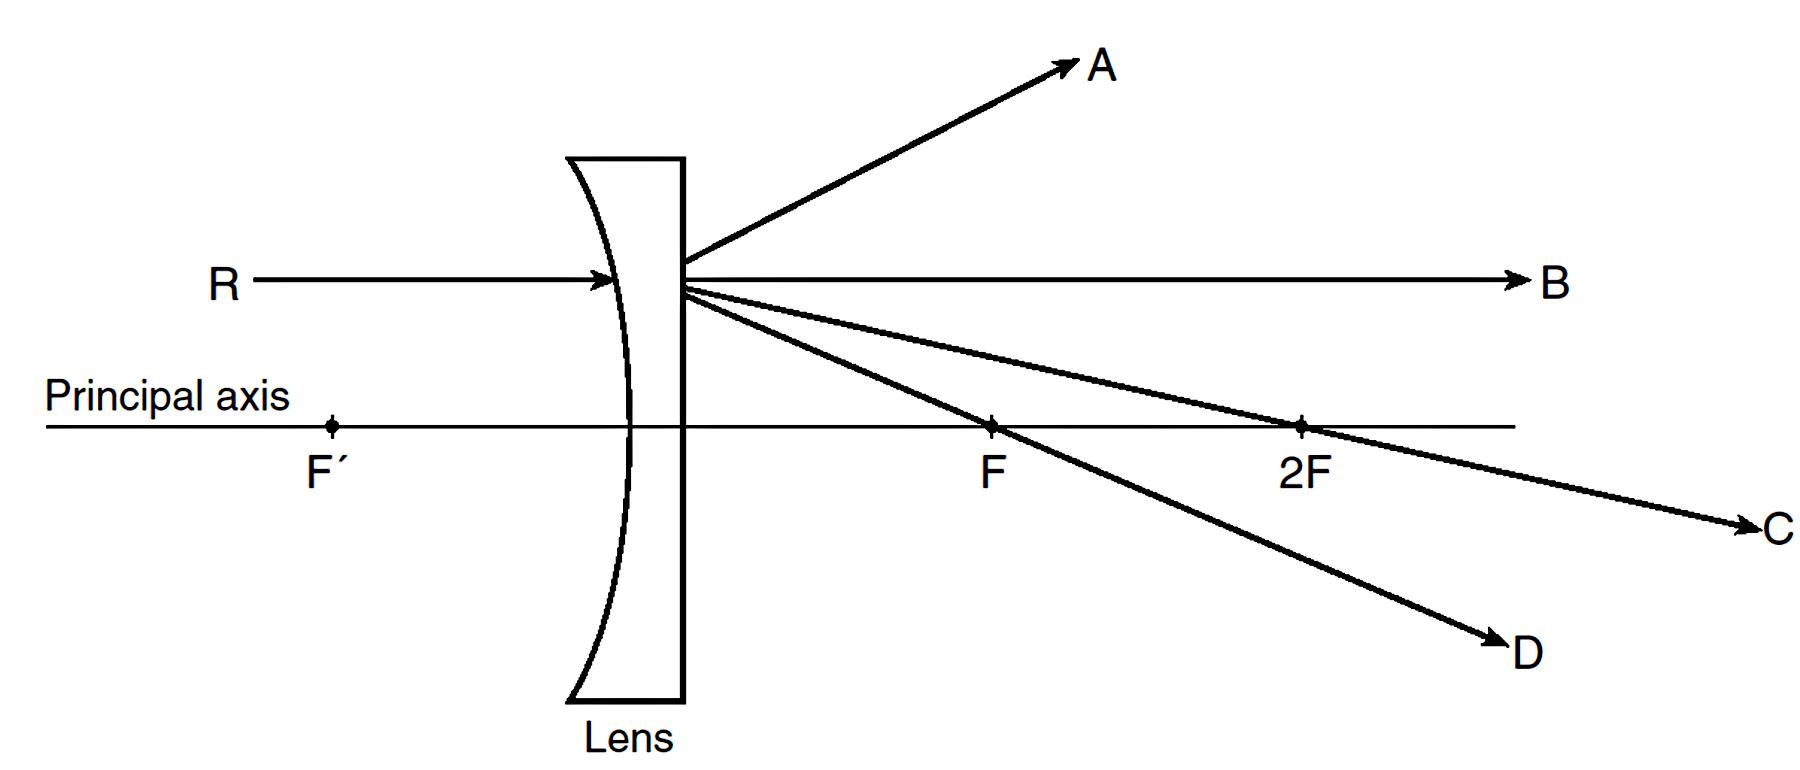 light ray diagram worksheets ford focus 2005 wiring diverging lens worksheet www topsimages com png 1800x770